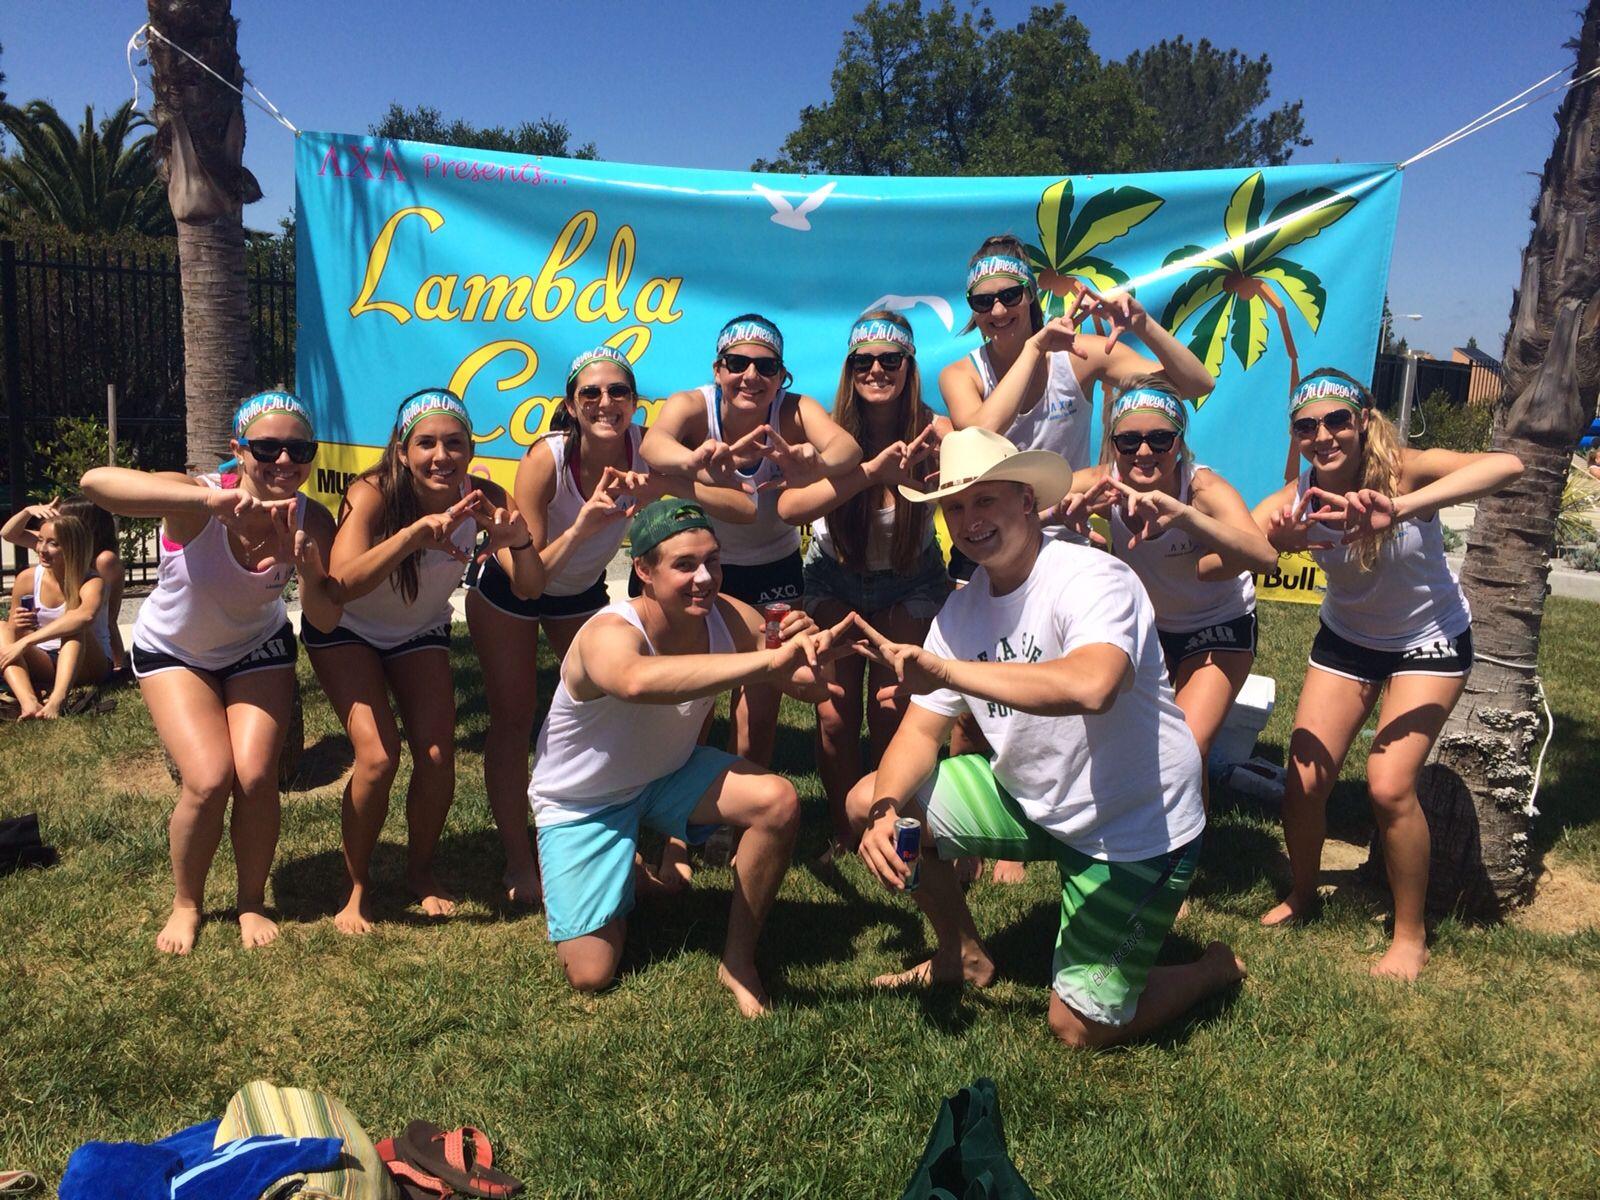 Axo Cal Poly At Lxa S Lambda Cabana Beach Volleyball Philanthropy Tournament Big Little Week Philanthropy Lambda